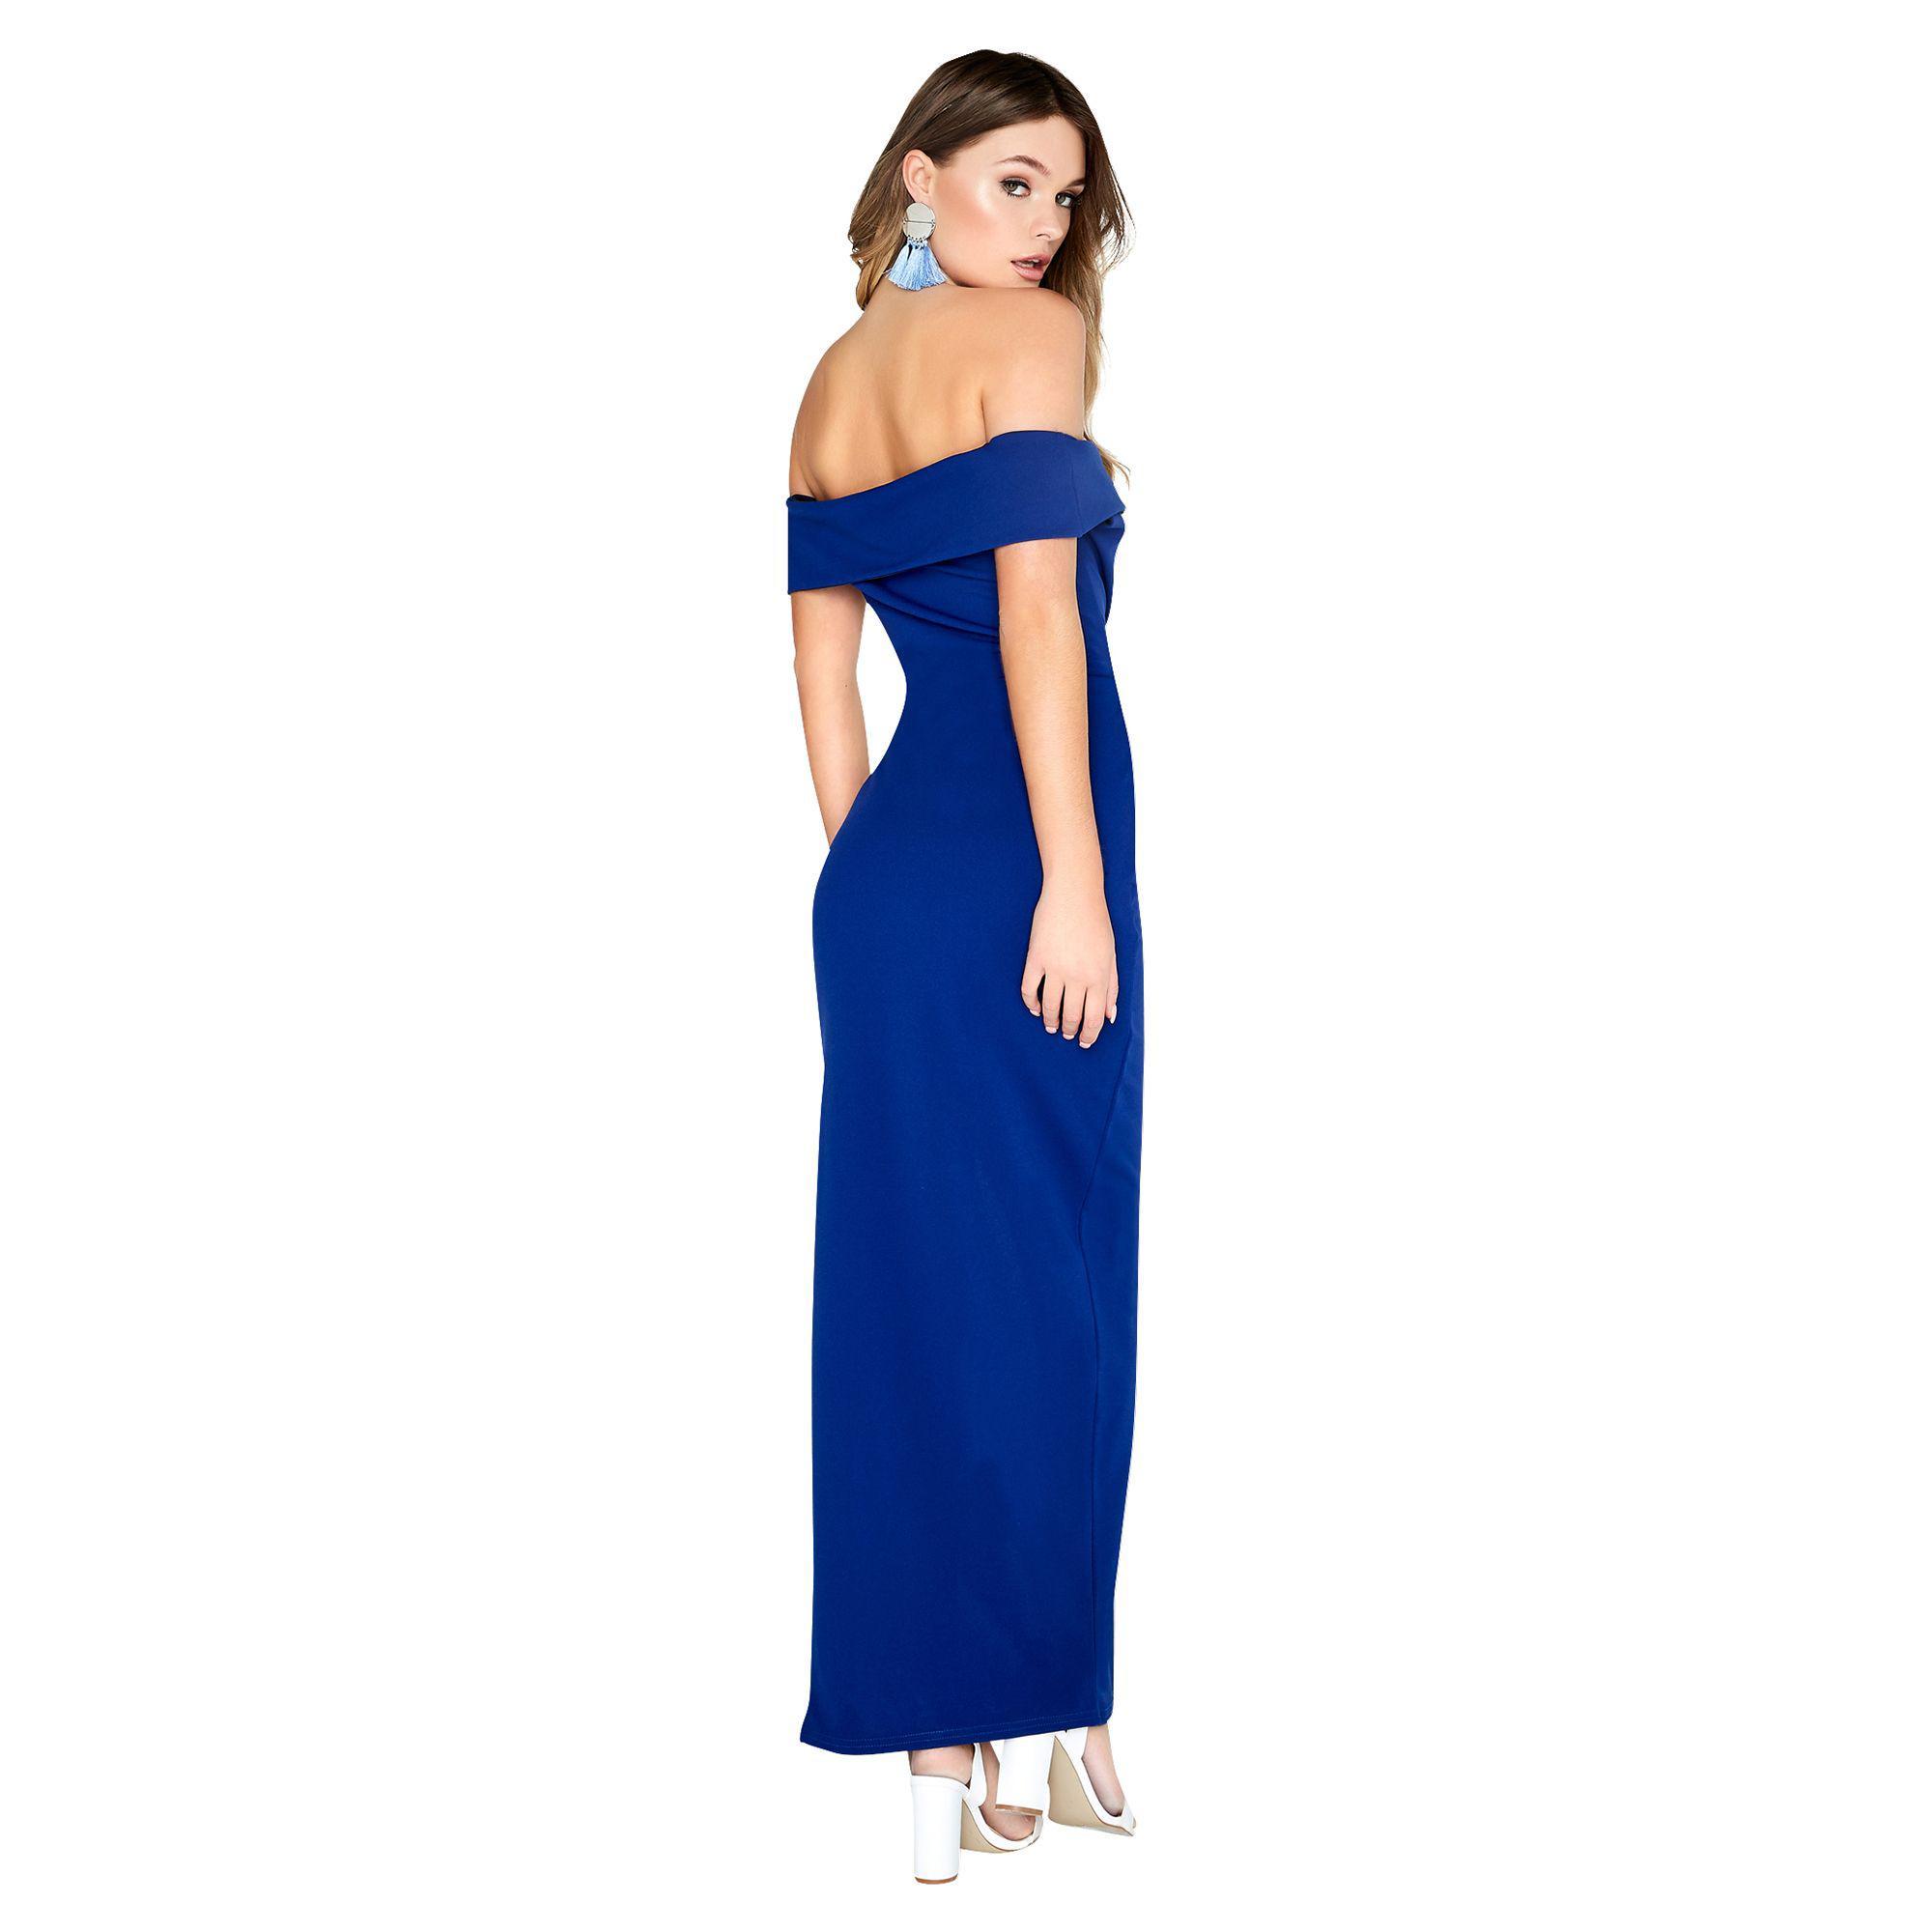 fc611aea0c09 Girls On Film Pose Foldover Bardot Maxi Dress in Blue - Lyst